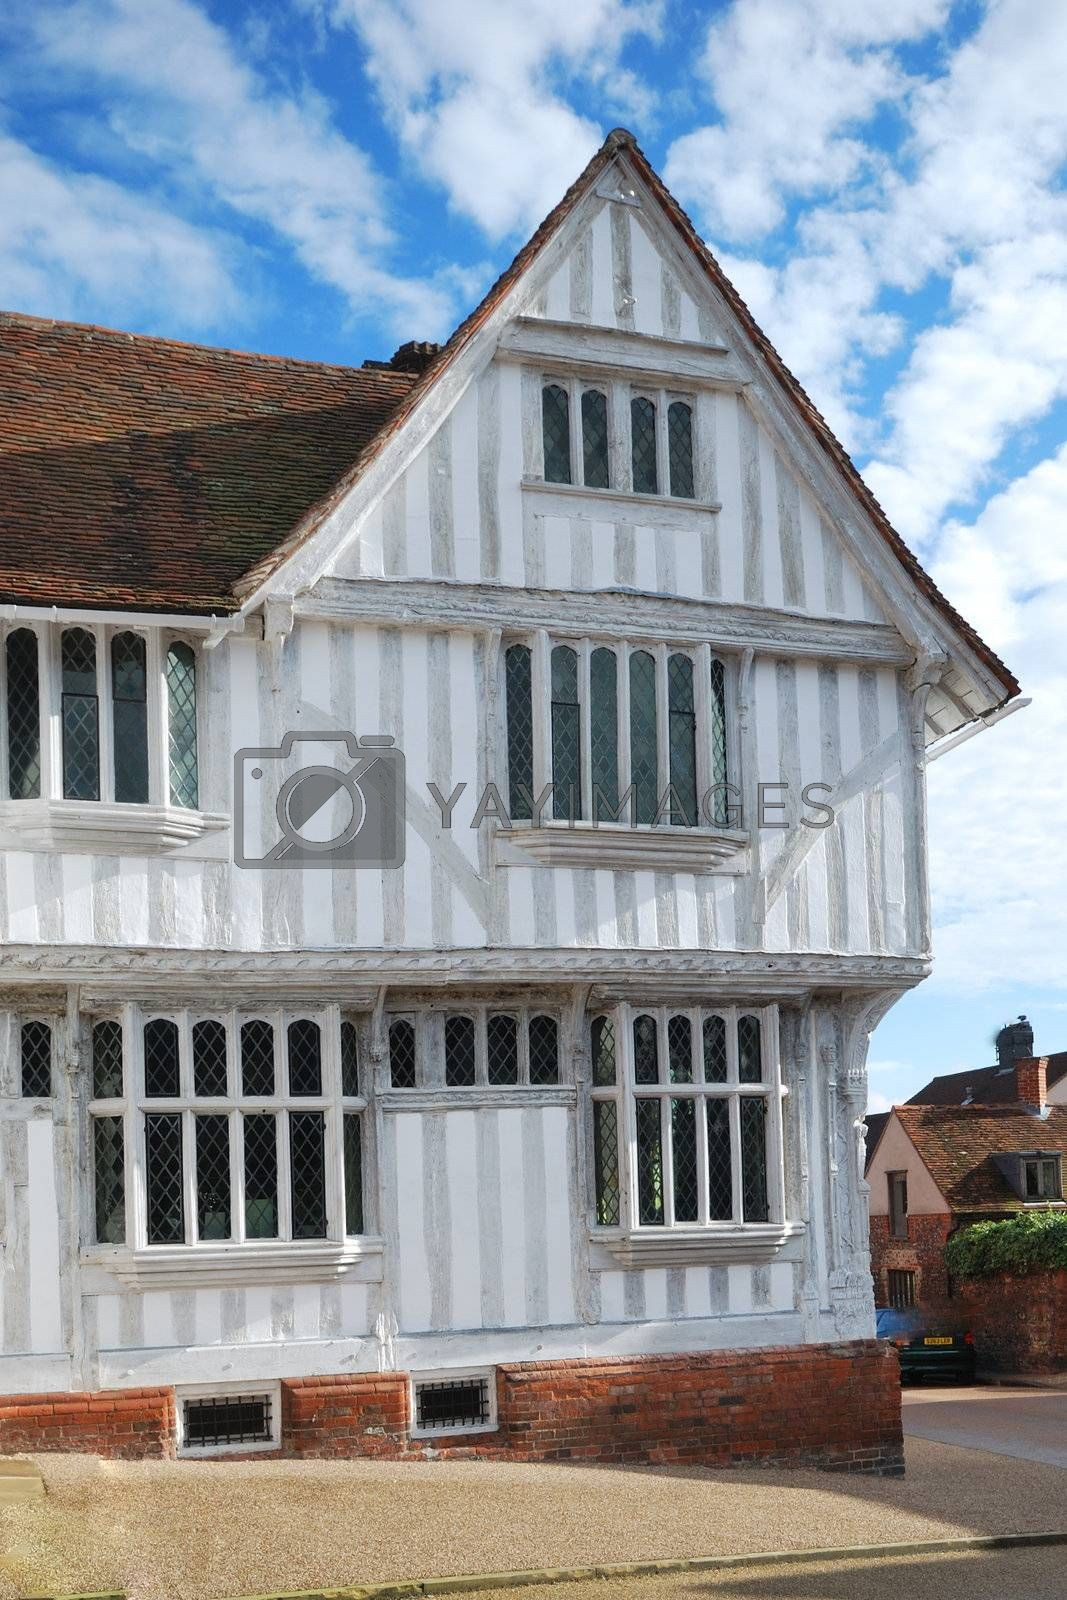 Tudor guildhall